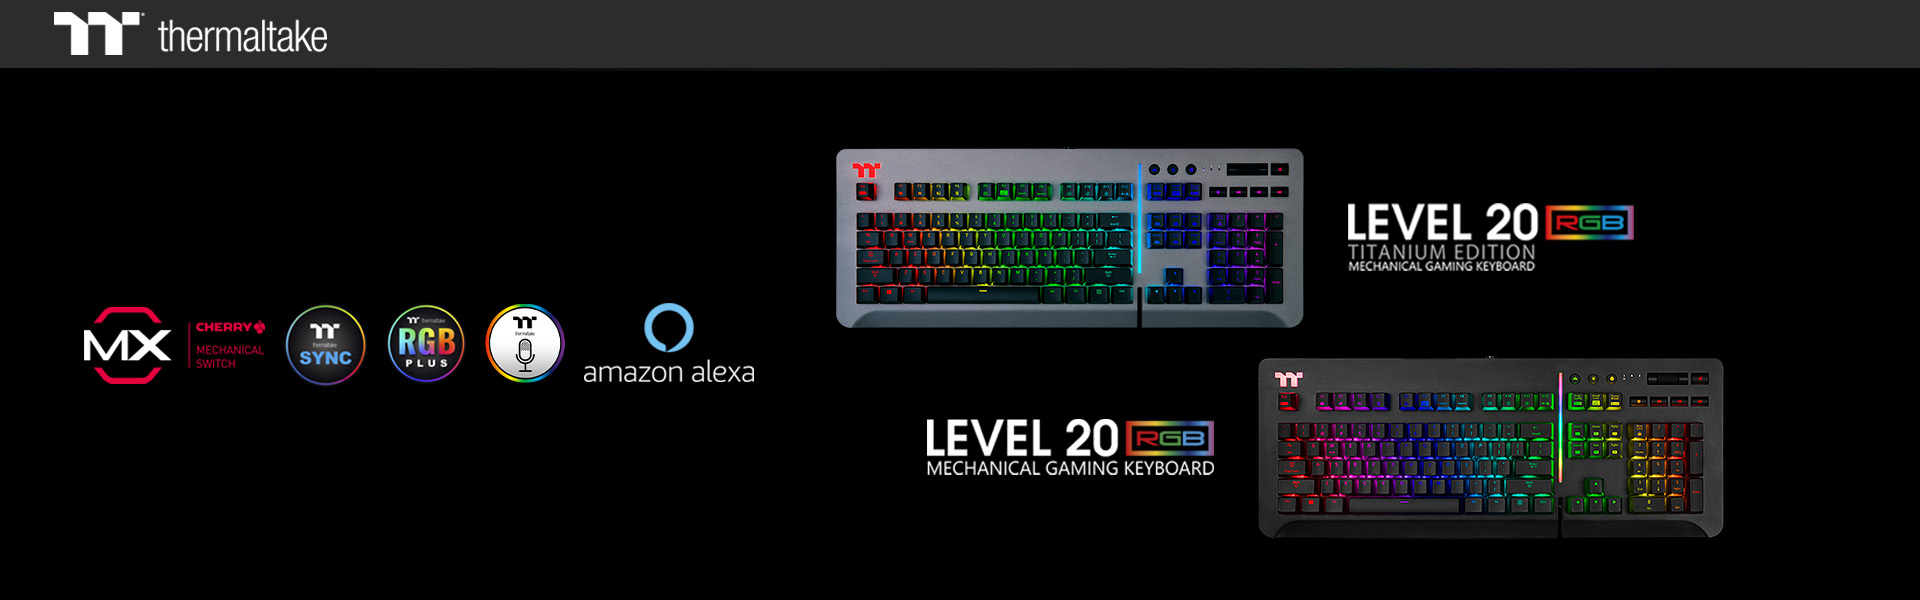 Thermaltake Gaming Unleashes New Level 20 RGB Gaming Keyboard_1